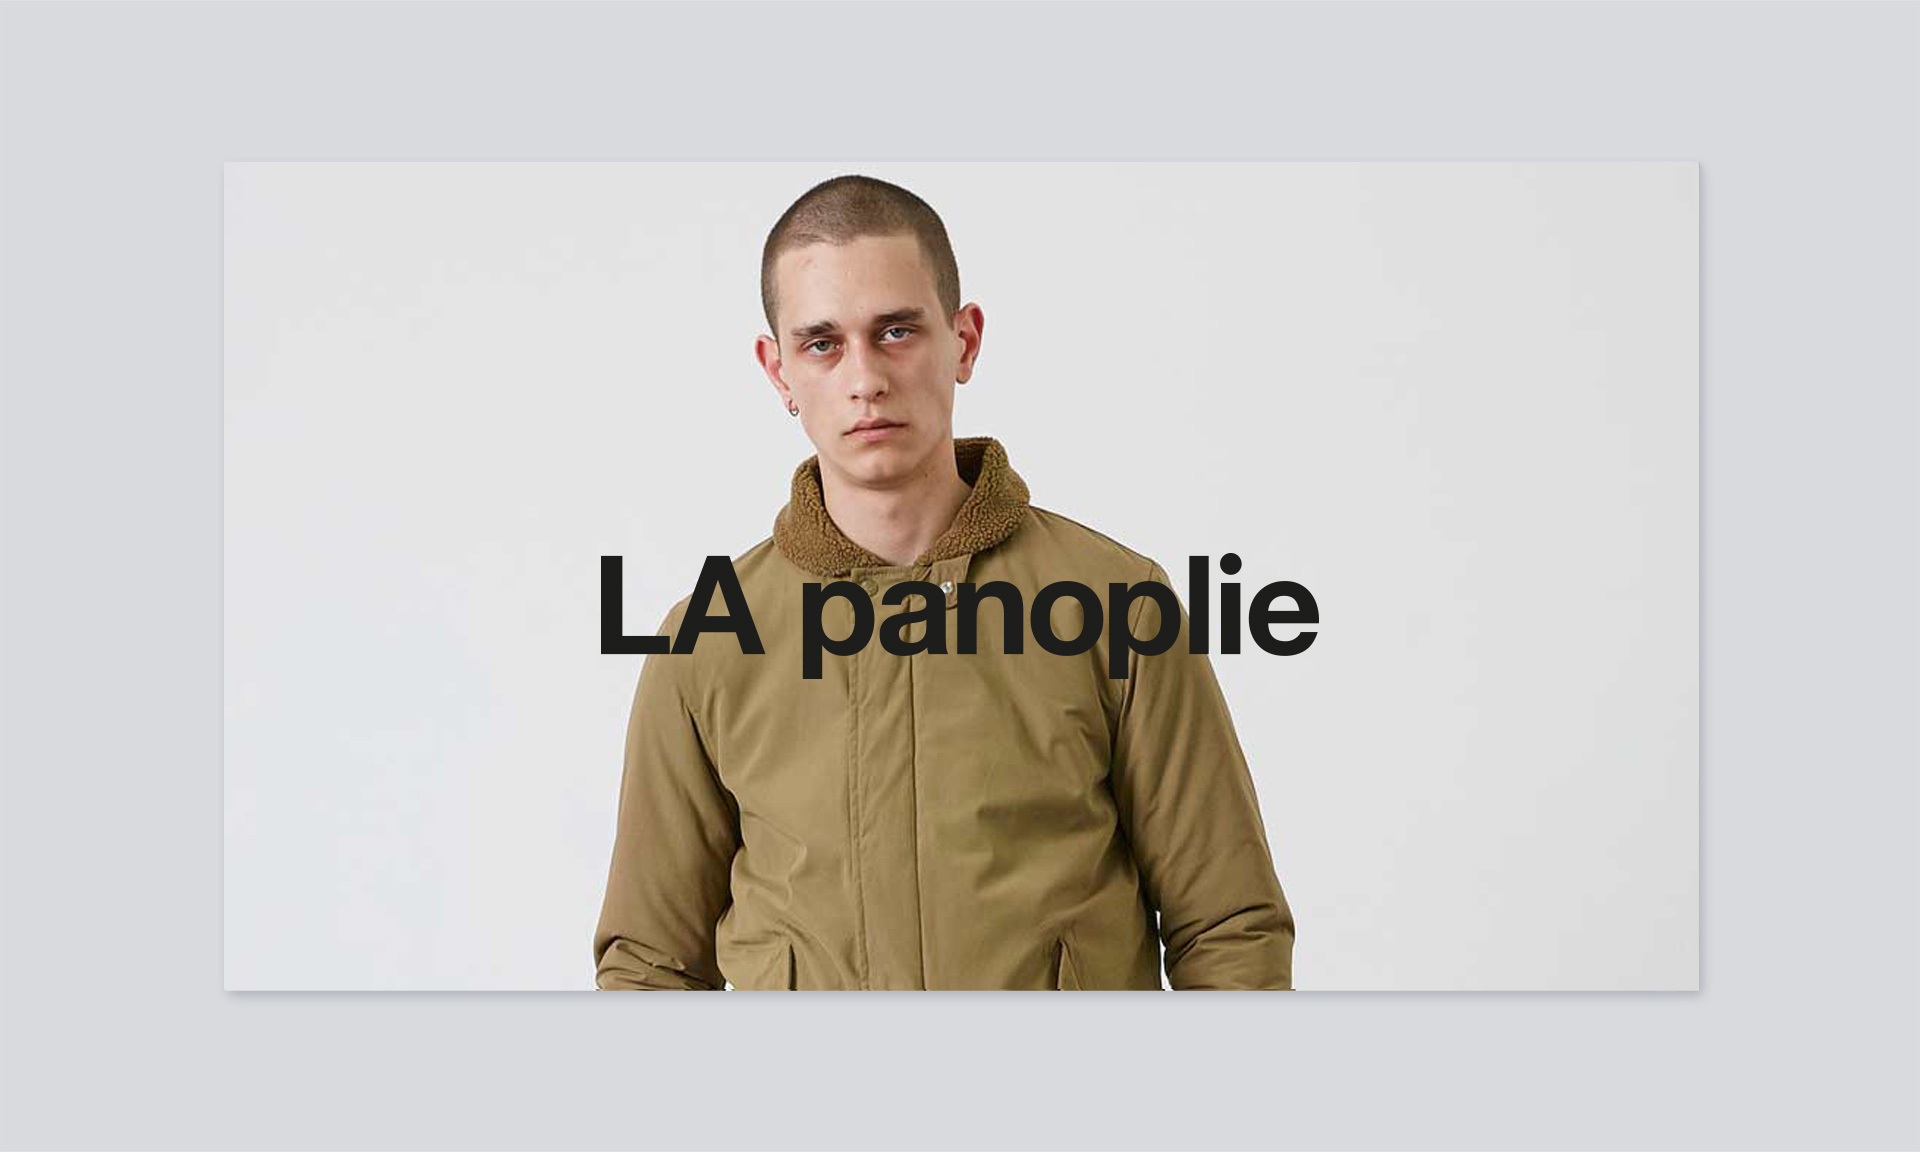 La Panoplie